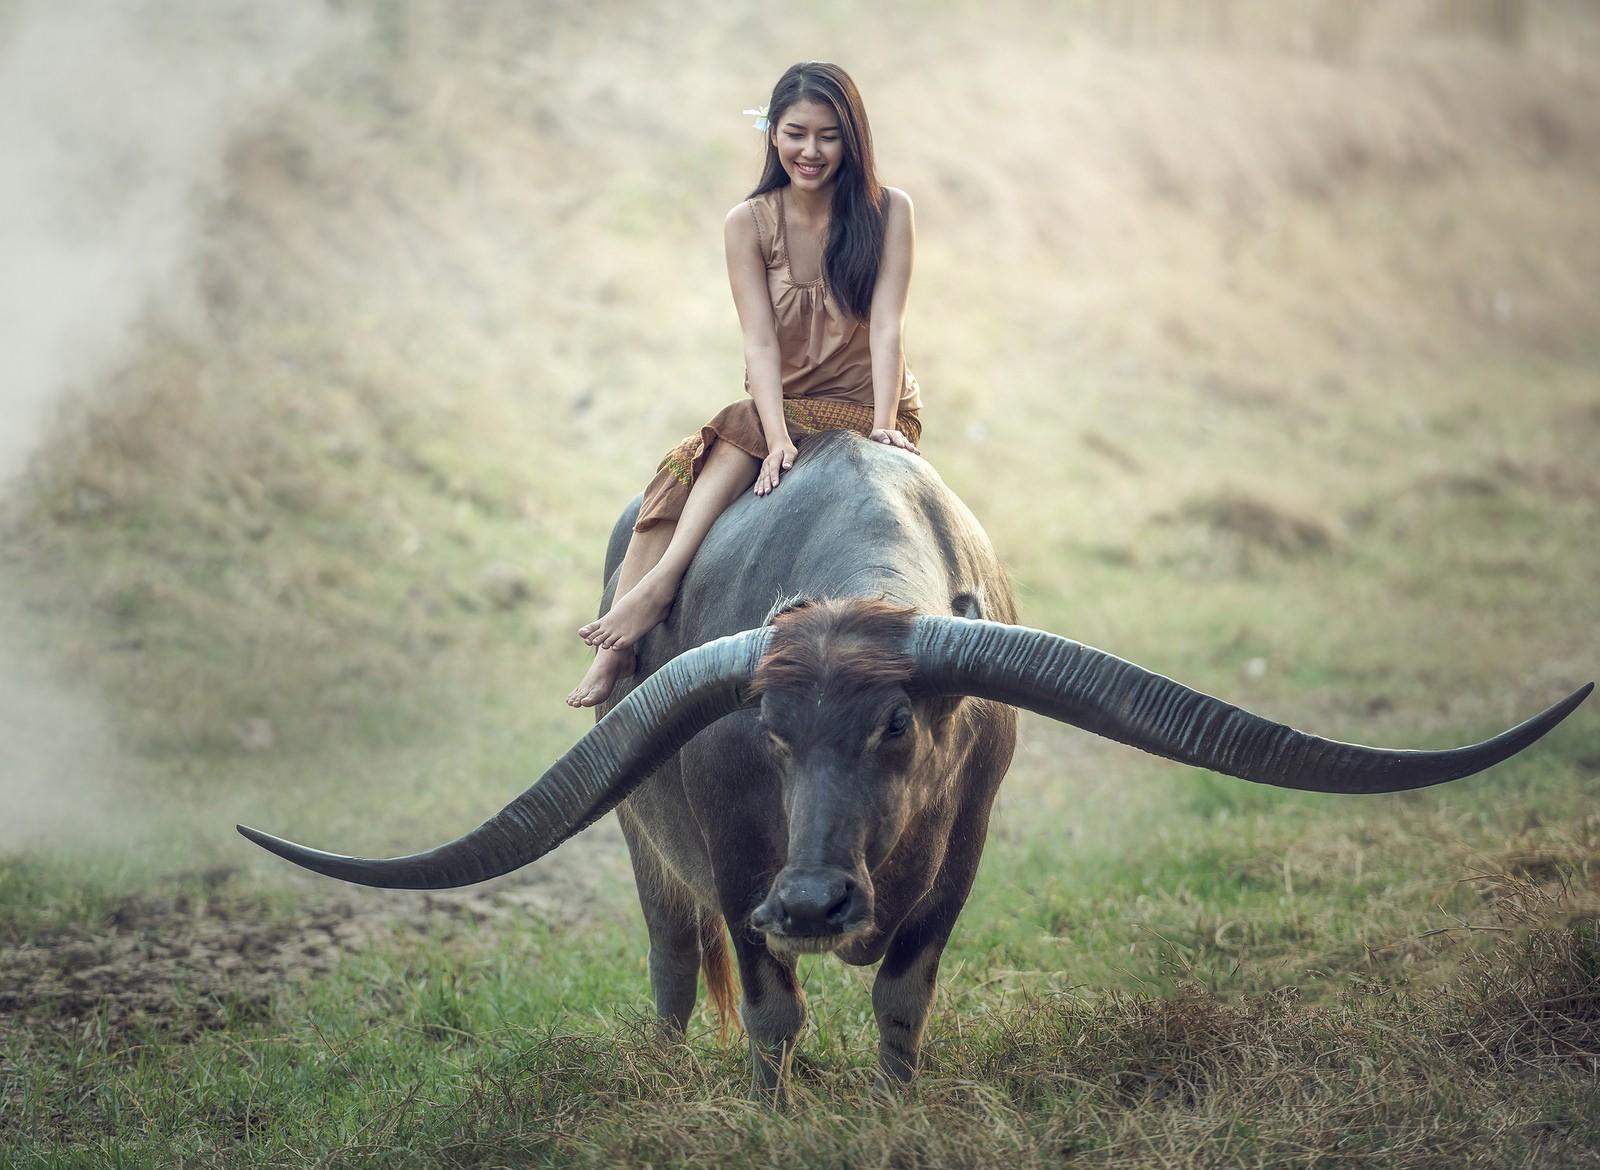 People 1600x1170 women outdoors women Asian brunette water buffalo horse riding brown dress flower in hair